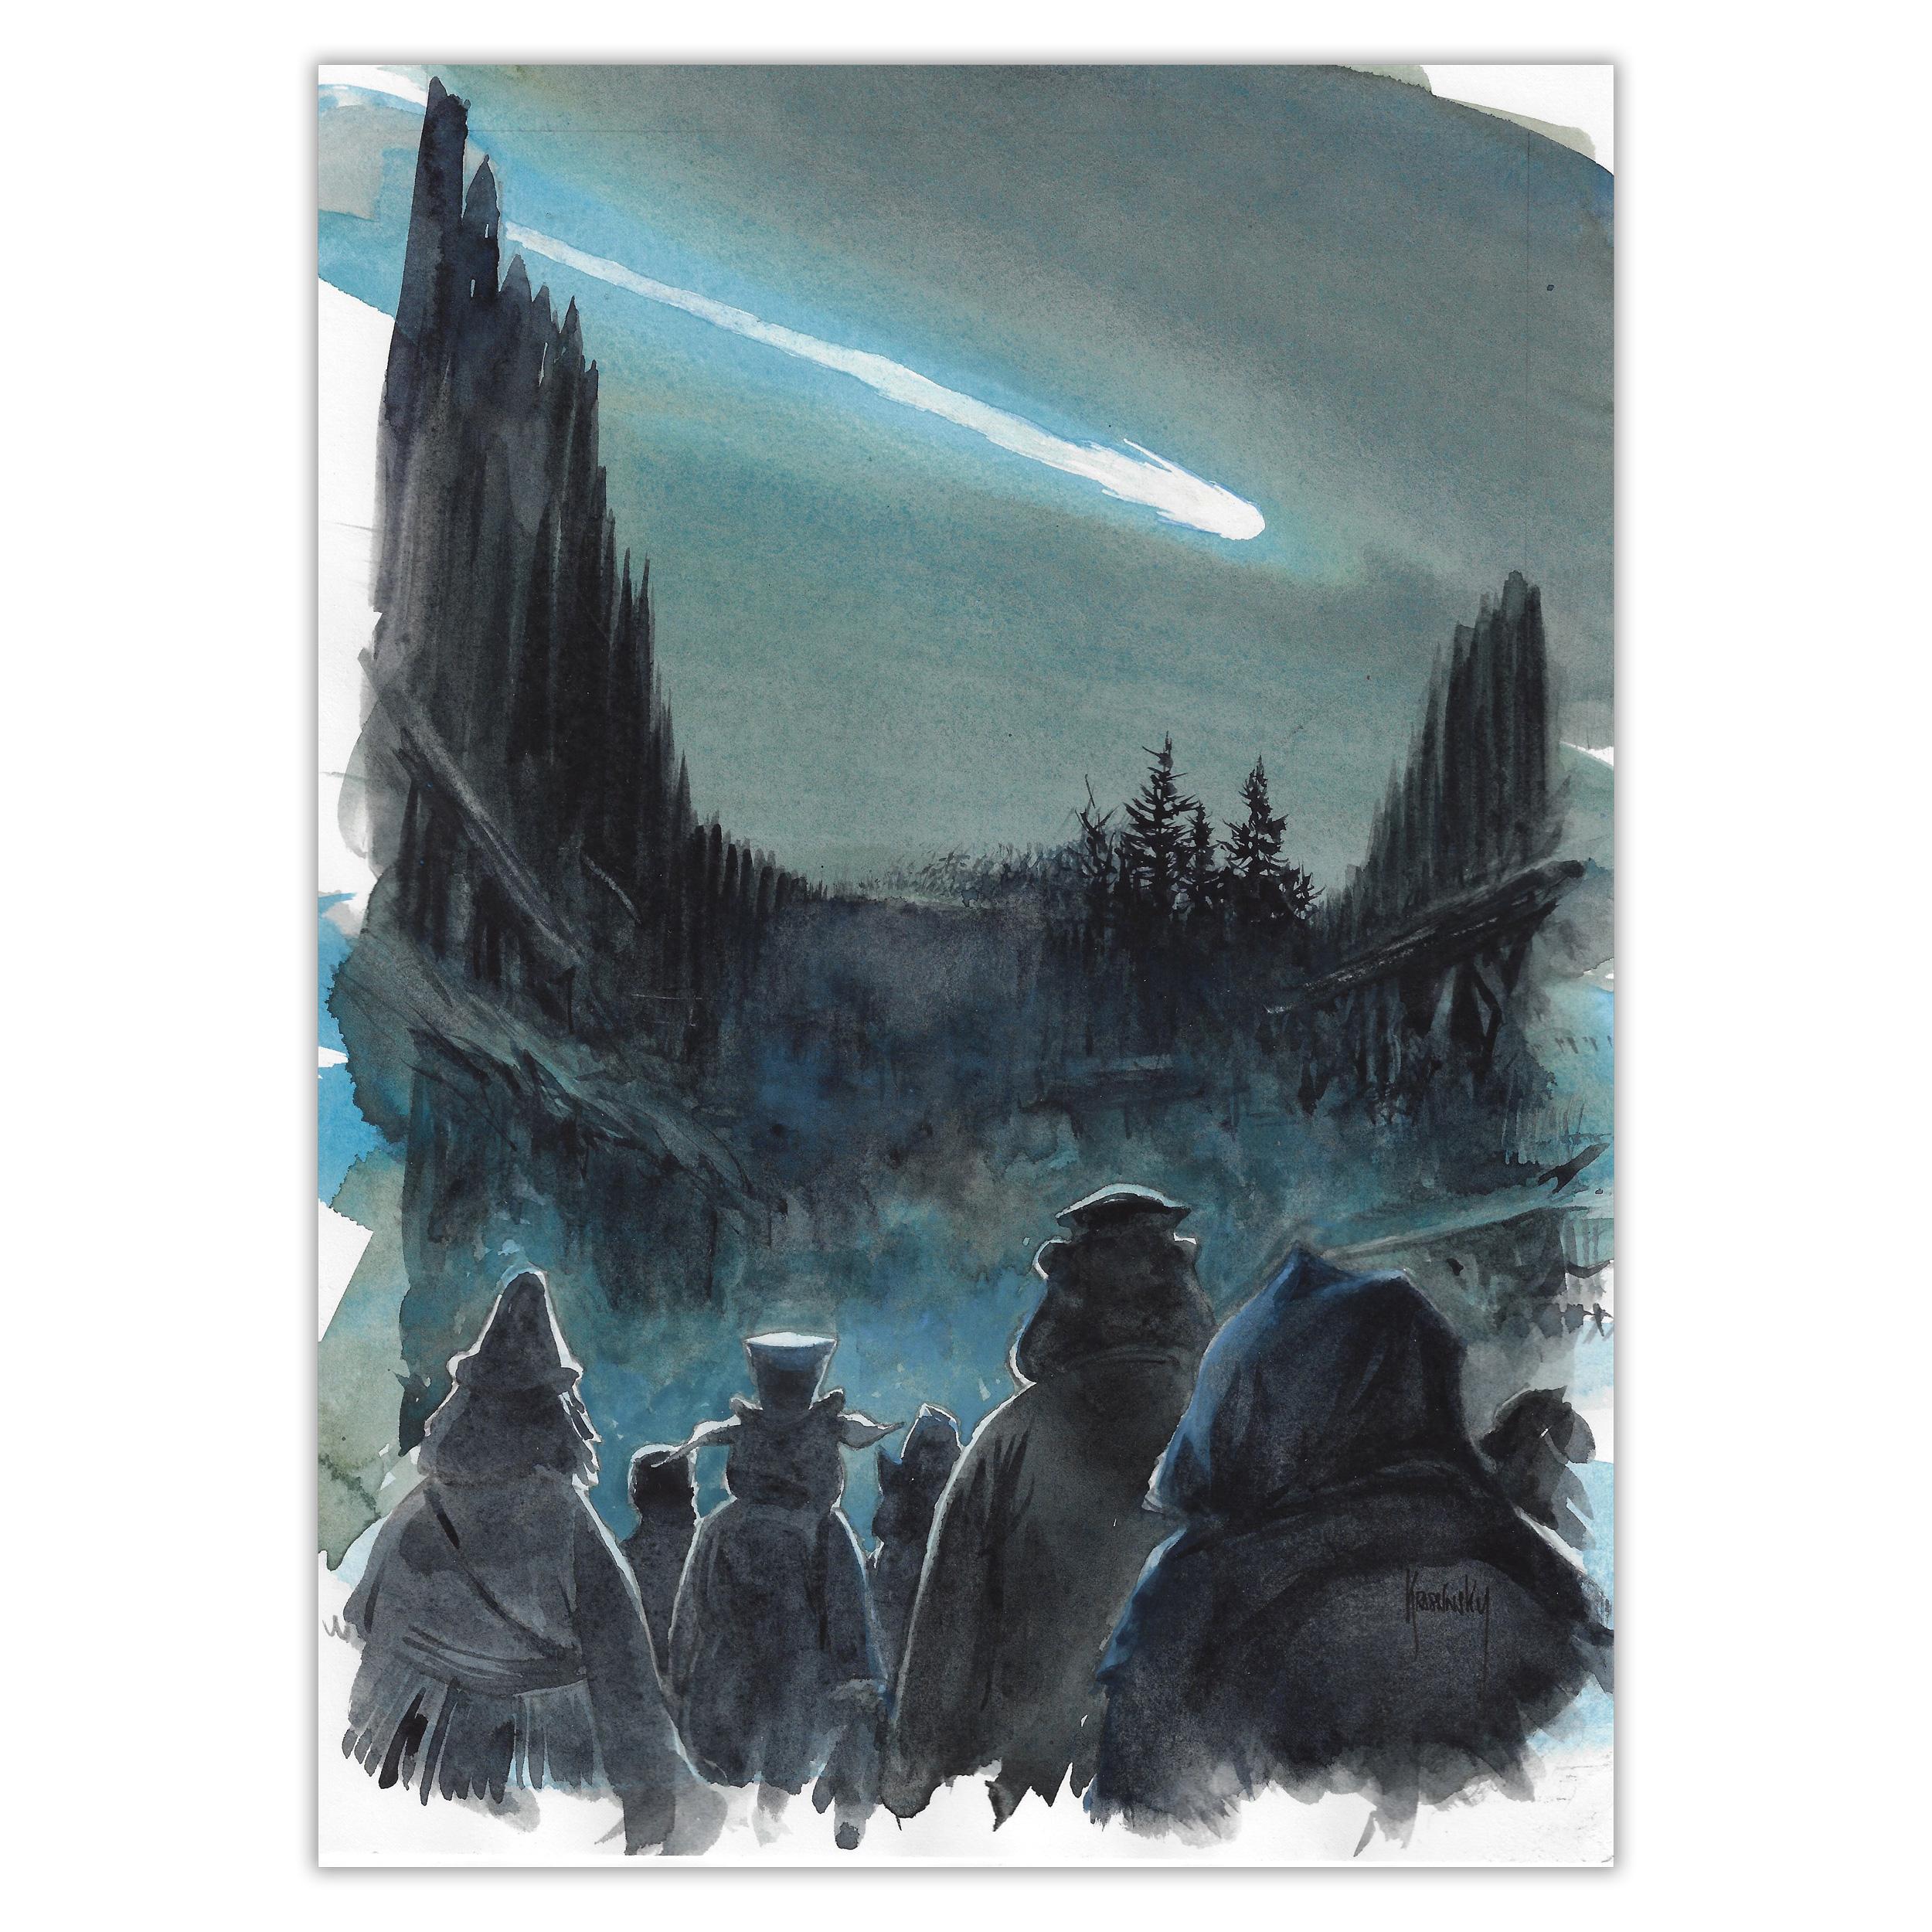 Krassinsky - La fin du monde en trinquant - Plan originale